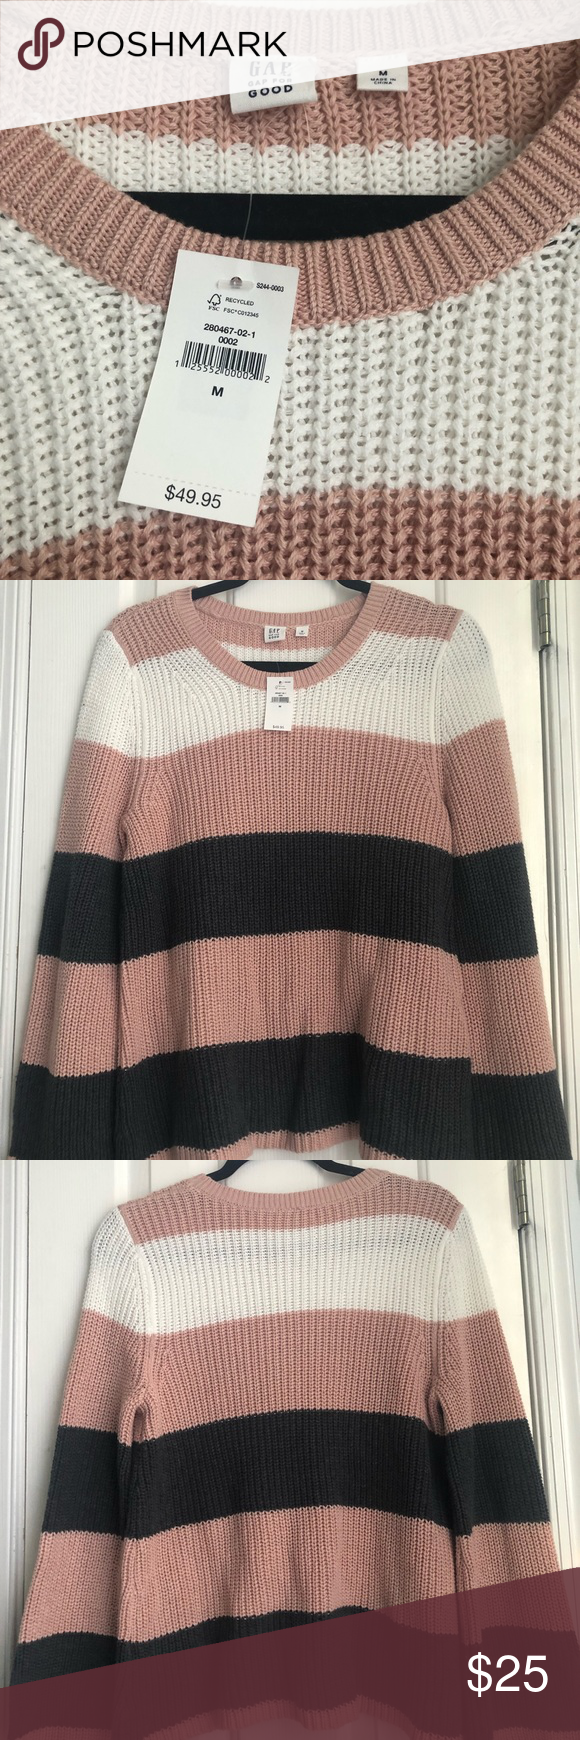 52cbadded Gap sweater size medium NWT in 2019